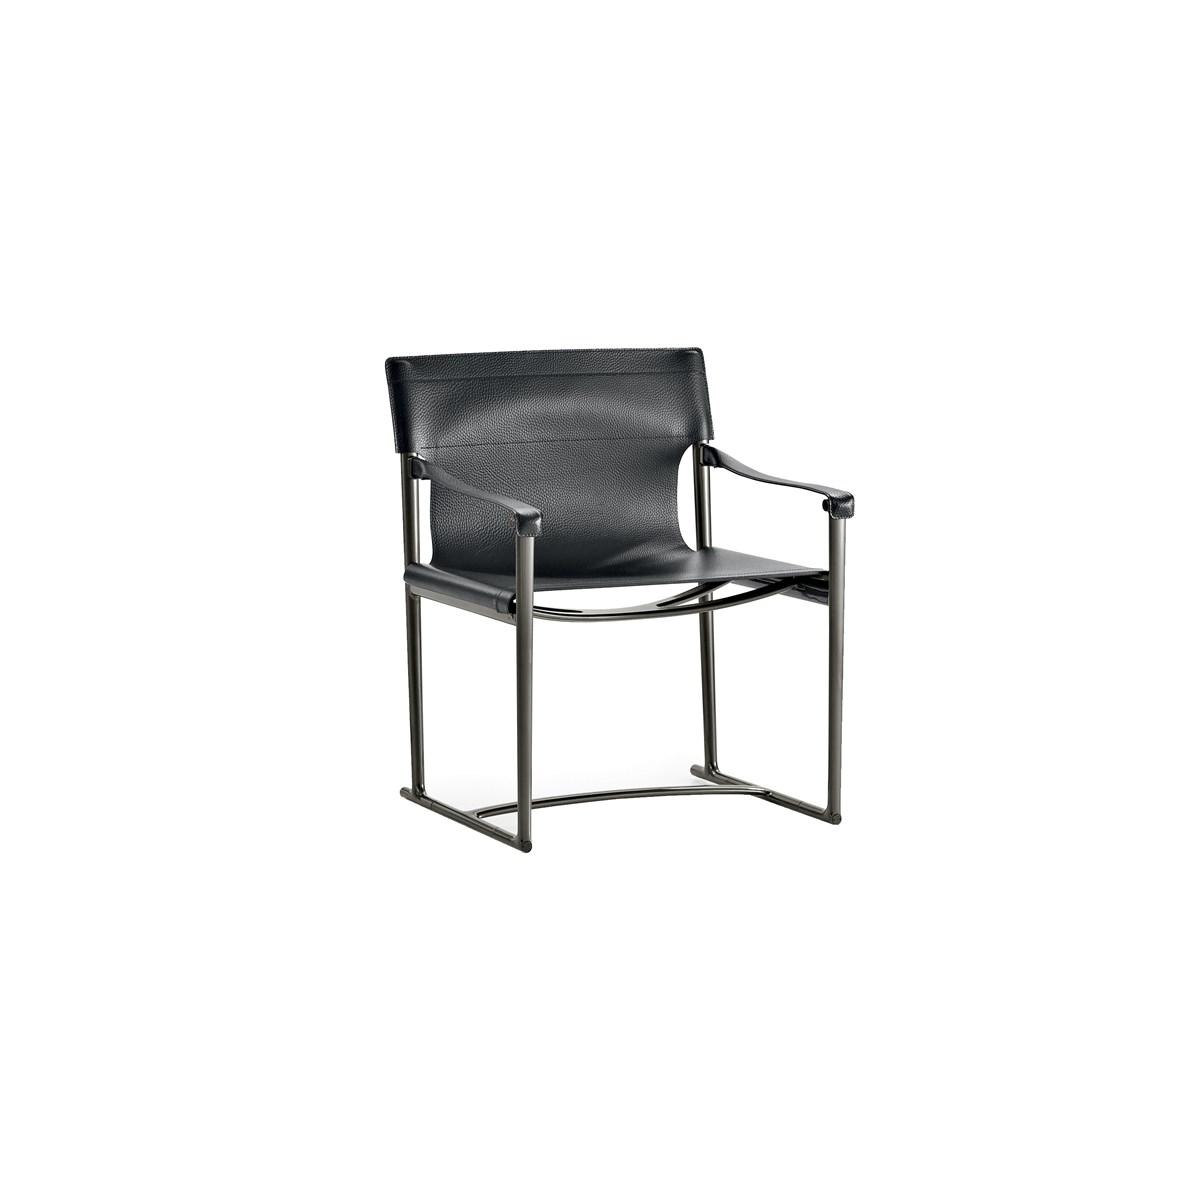 B&B-Italia-Antonio-Citterio-Mirto-Chair-Matisse-1